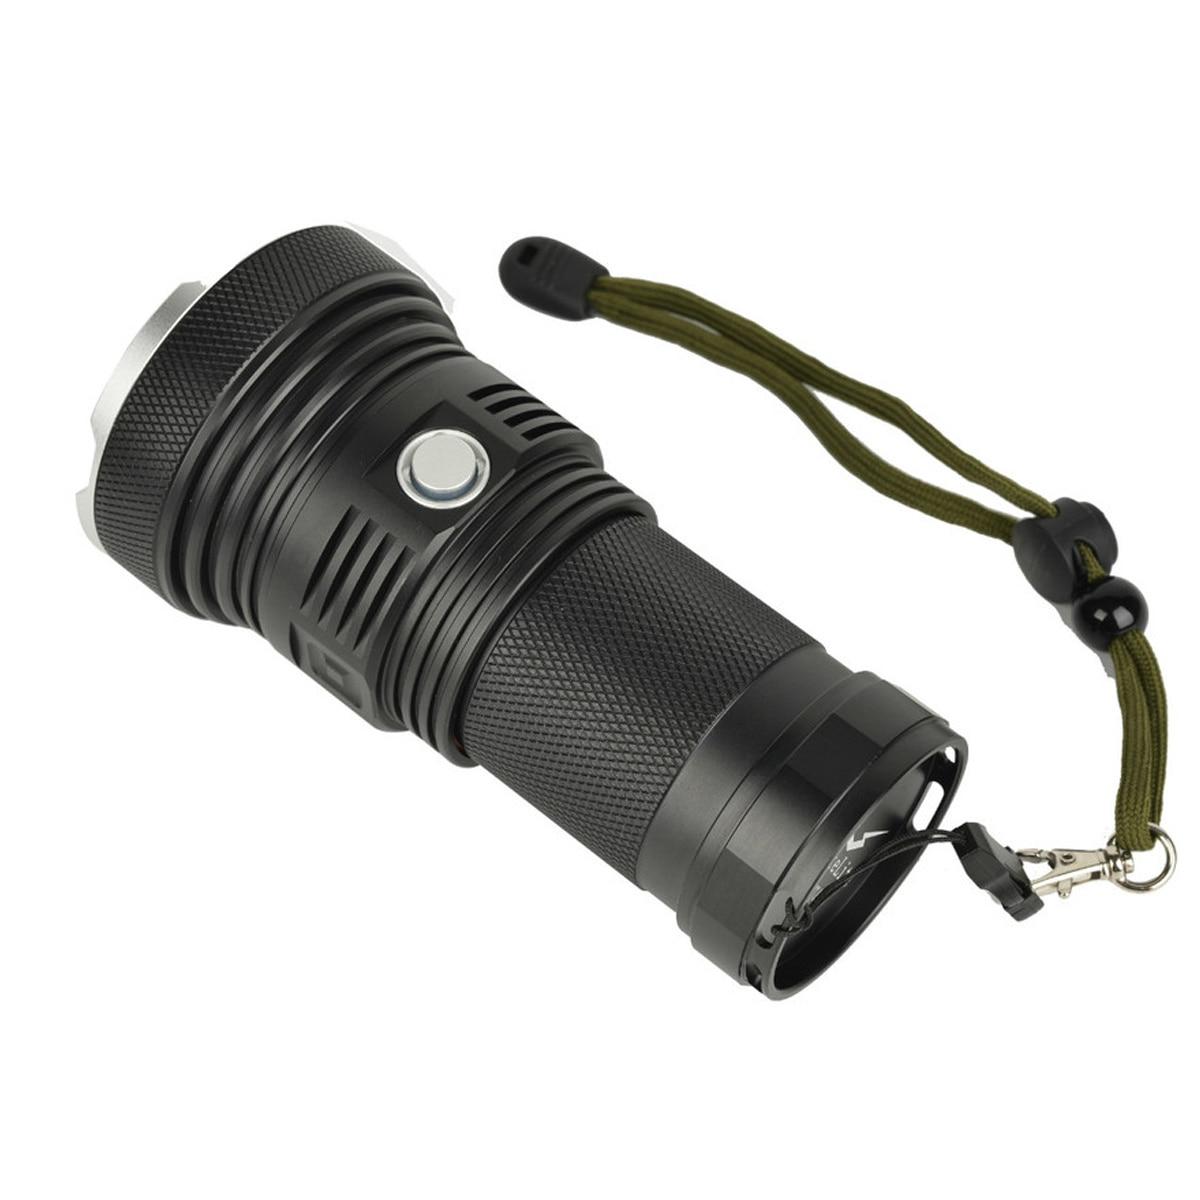 Haikelite LED Flashlight IPX8 SST40 MT40 4 Lamps 6500 Lumens Super Bright Torch Waterproof Outdoor Camping Light 1400m enlarge